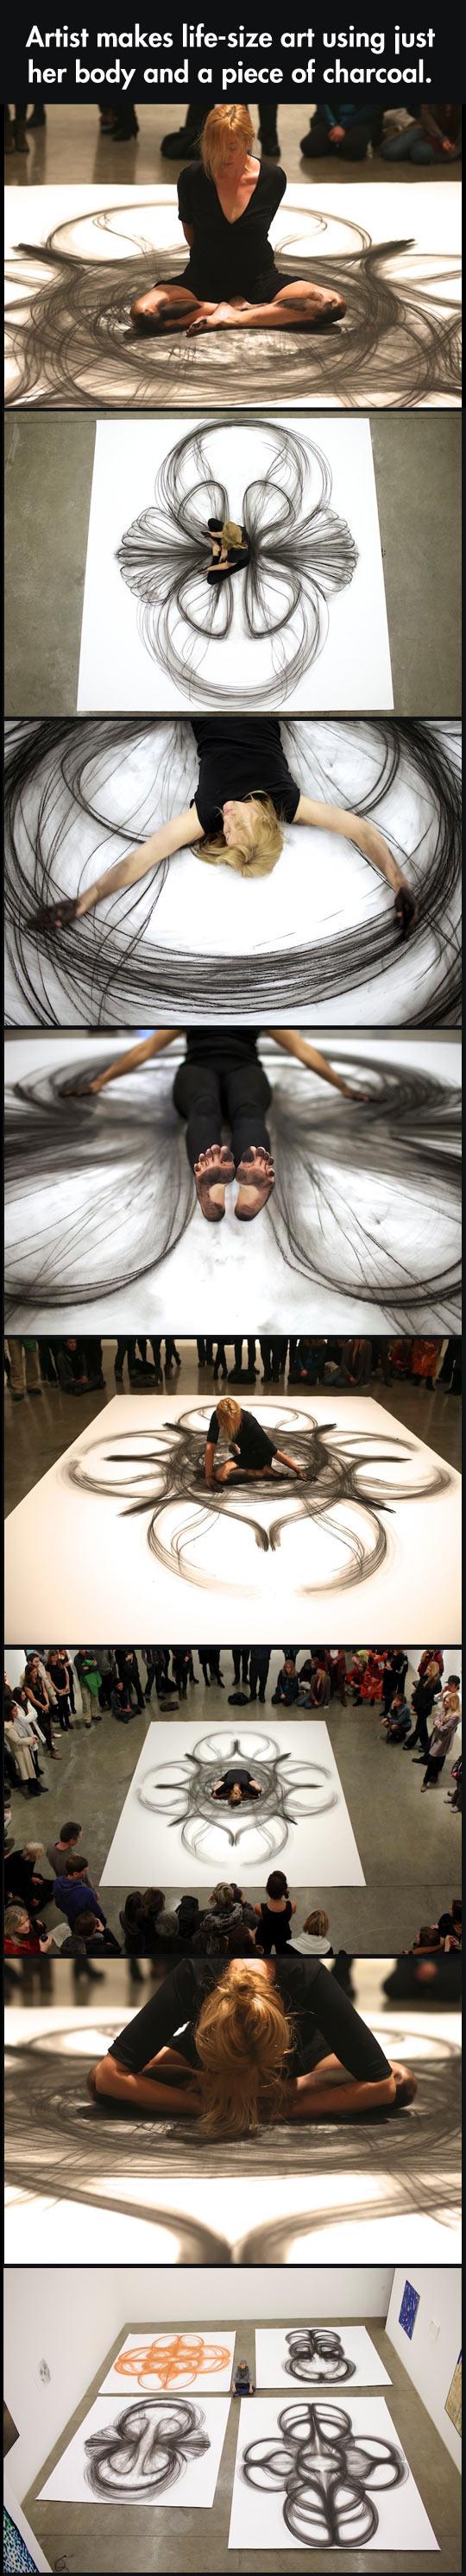 Life-sized art…